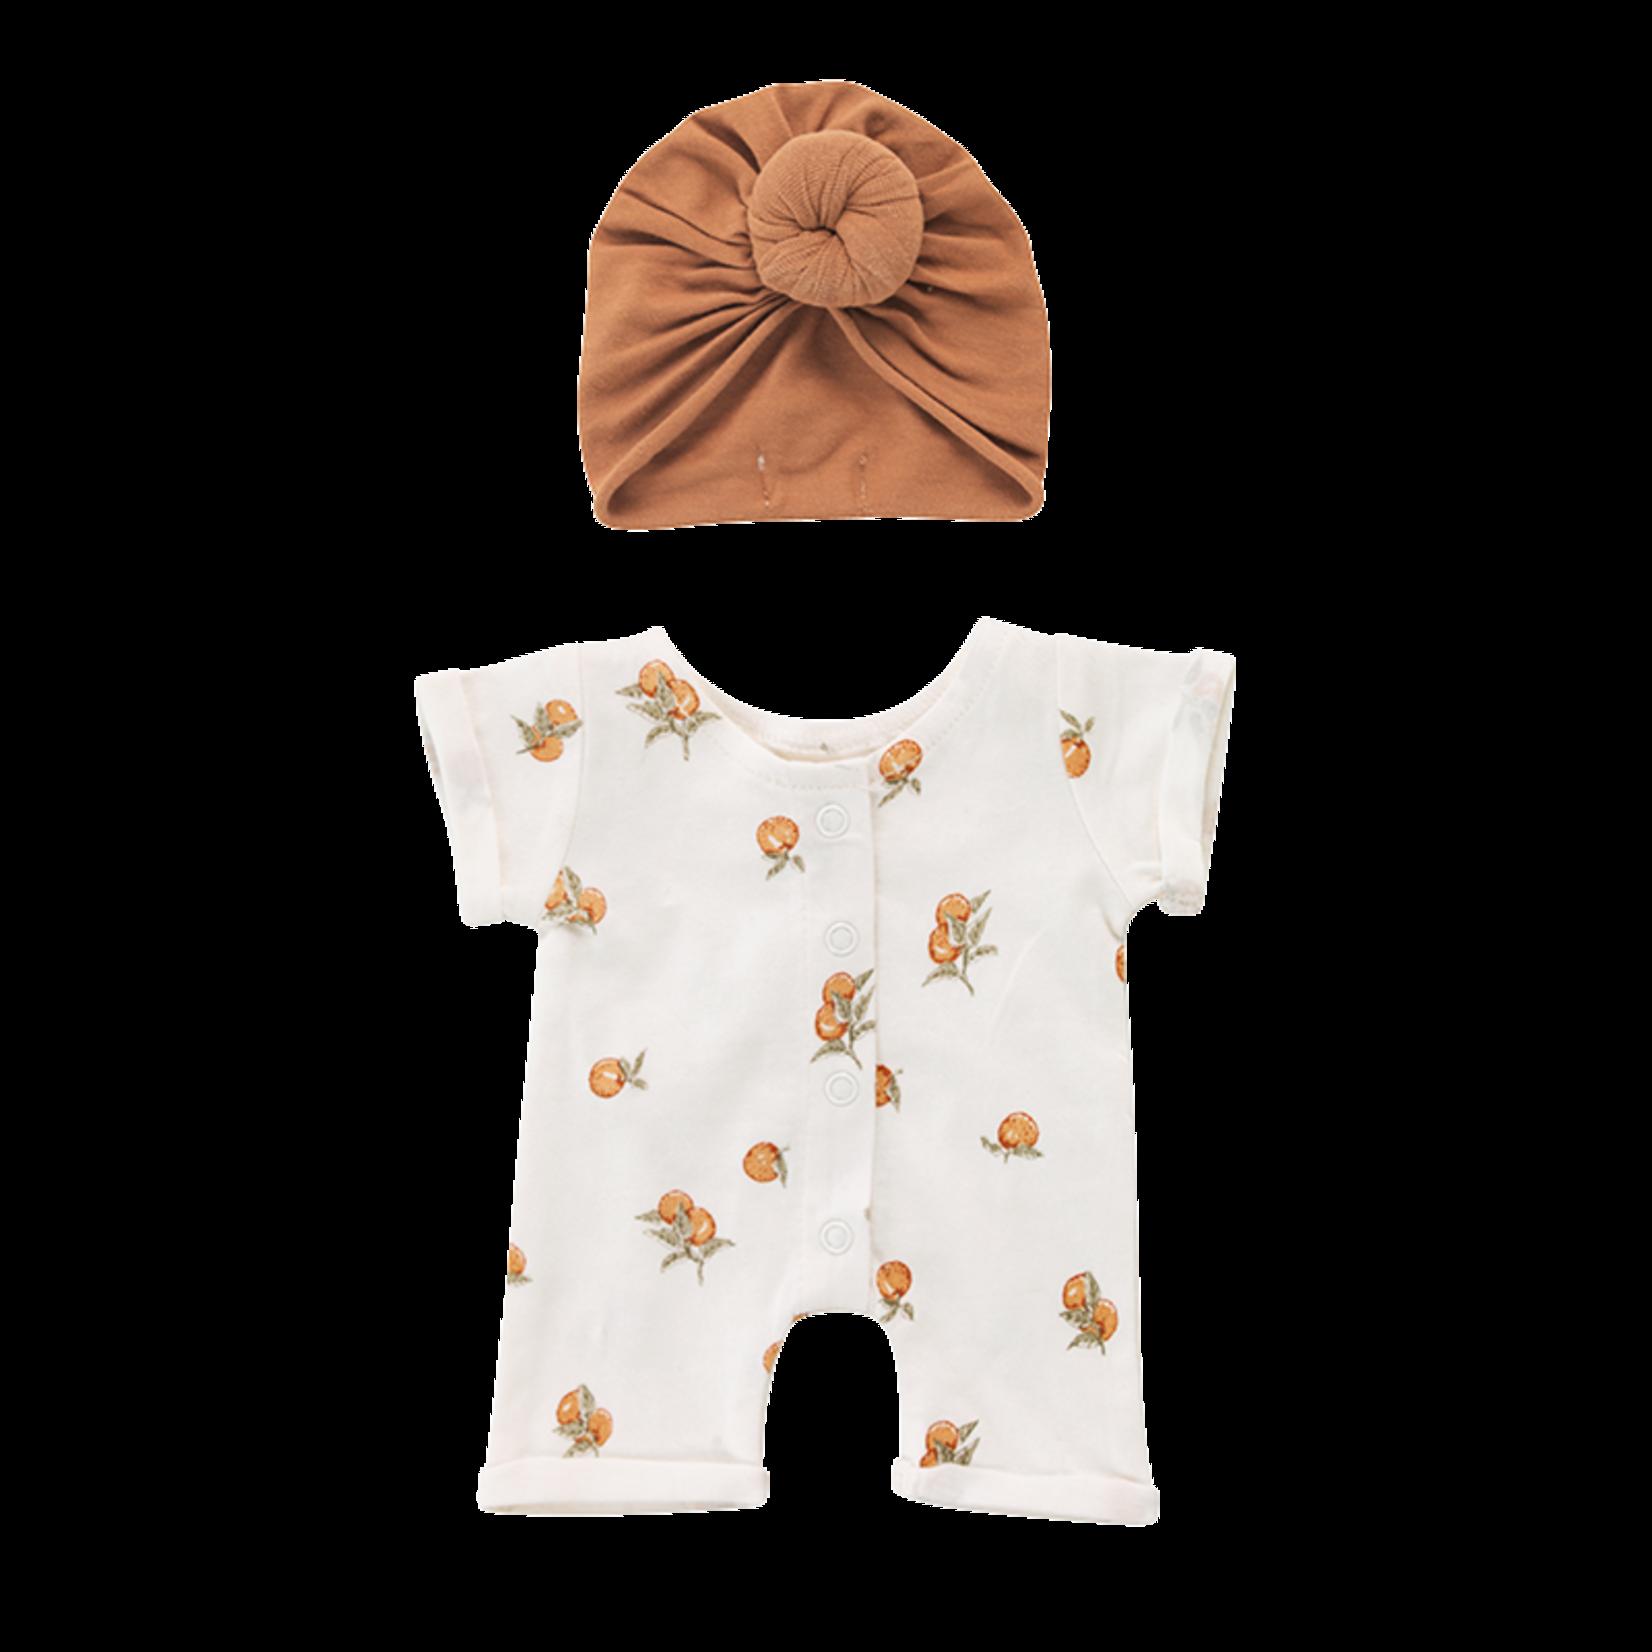 Bonjour Little Bonjour Little Doll outfit Marbella/Pampa